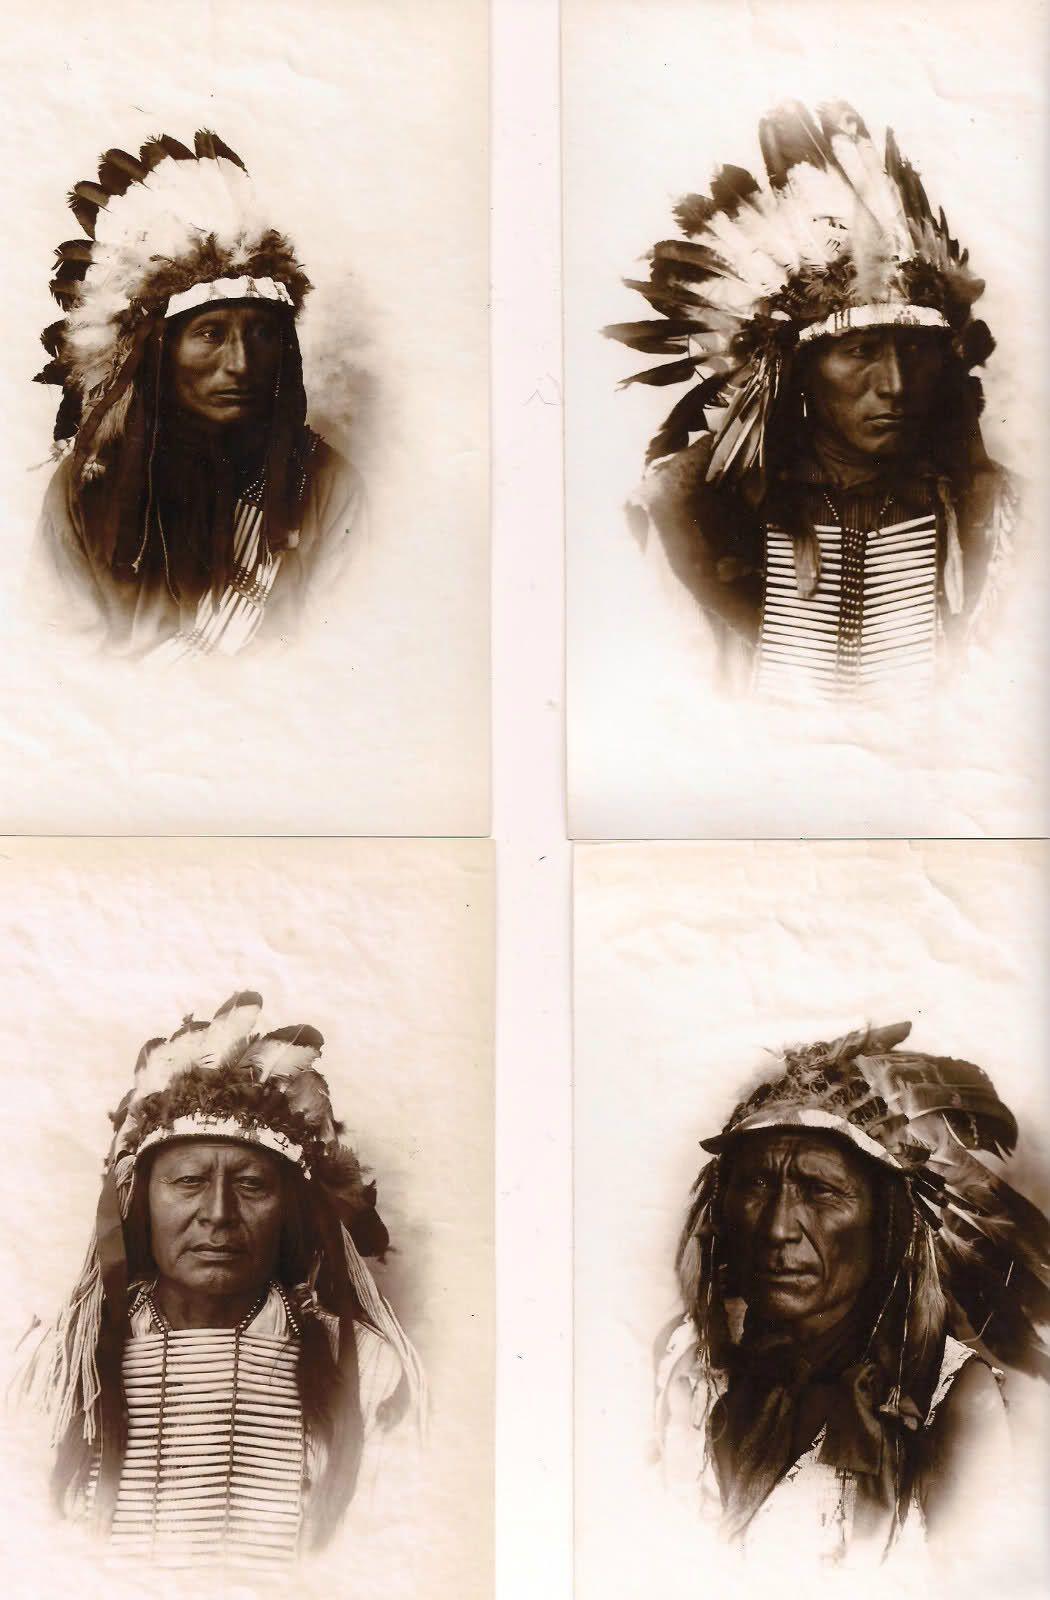 1896 Lakota Sioux in Cincinnati, Ohio. Photos by Enno Meyer.